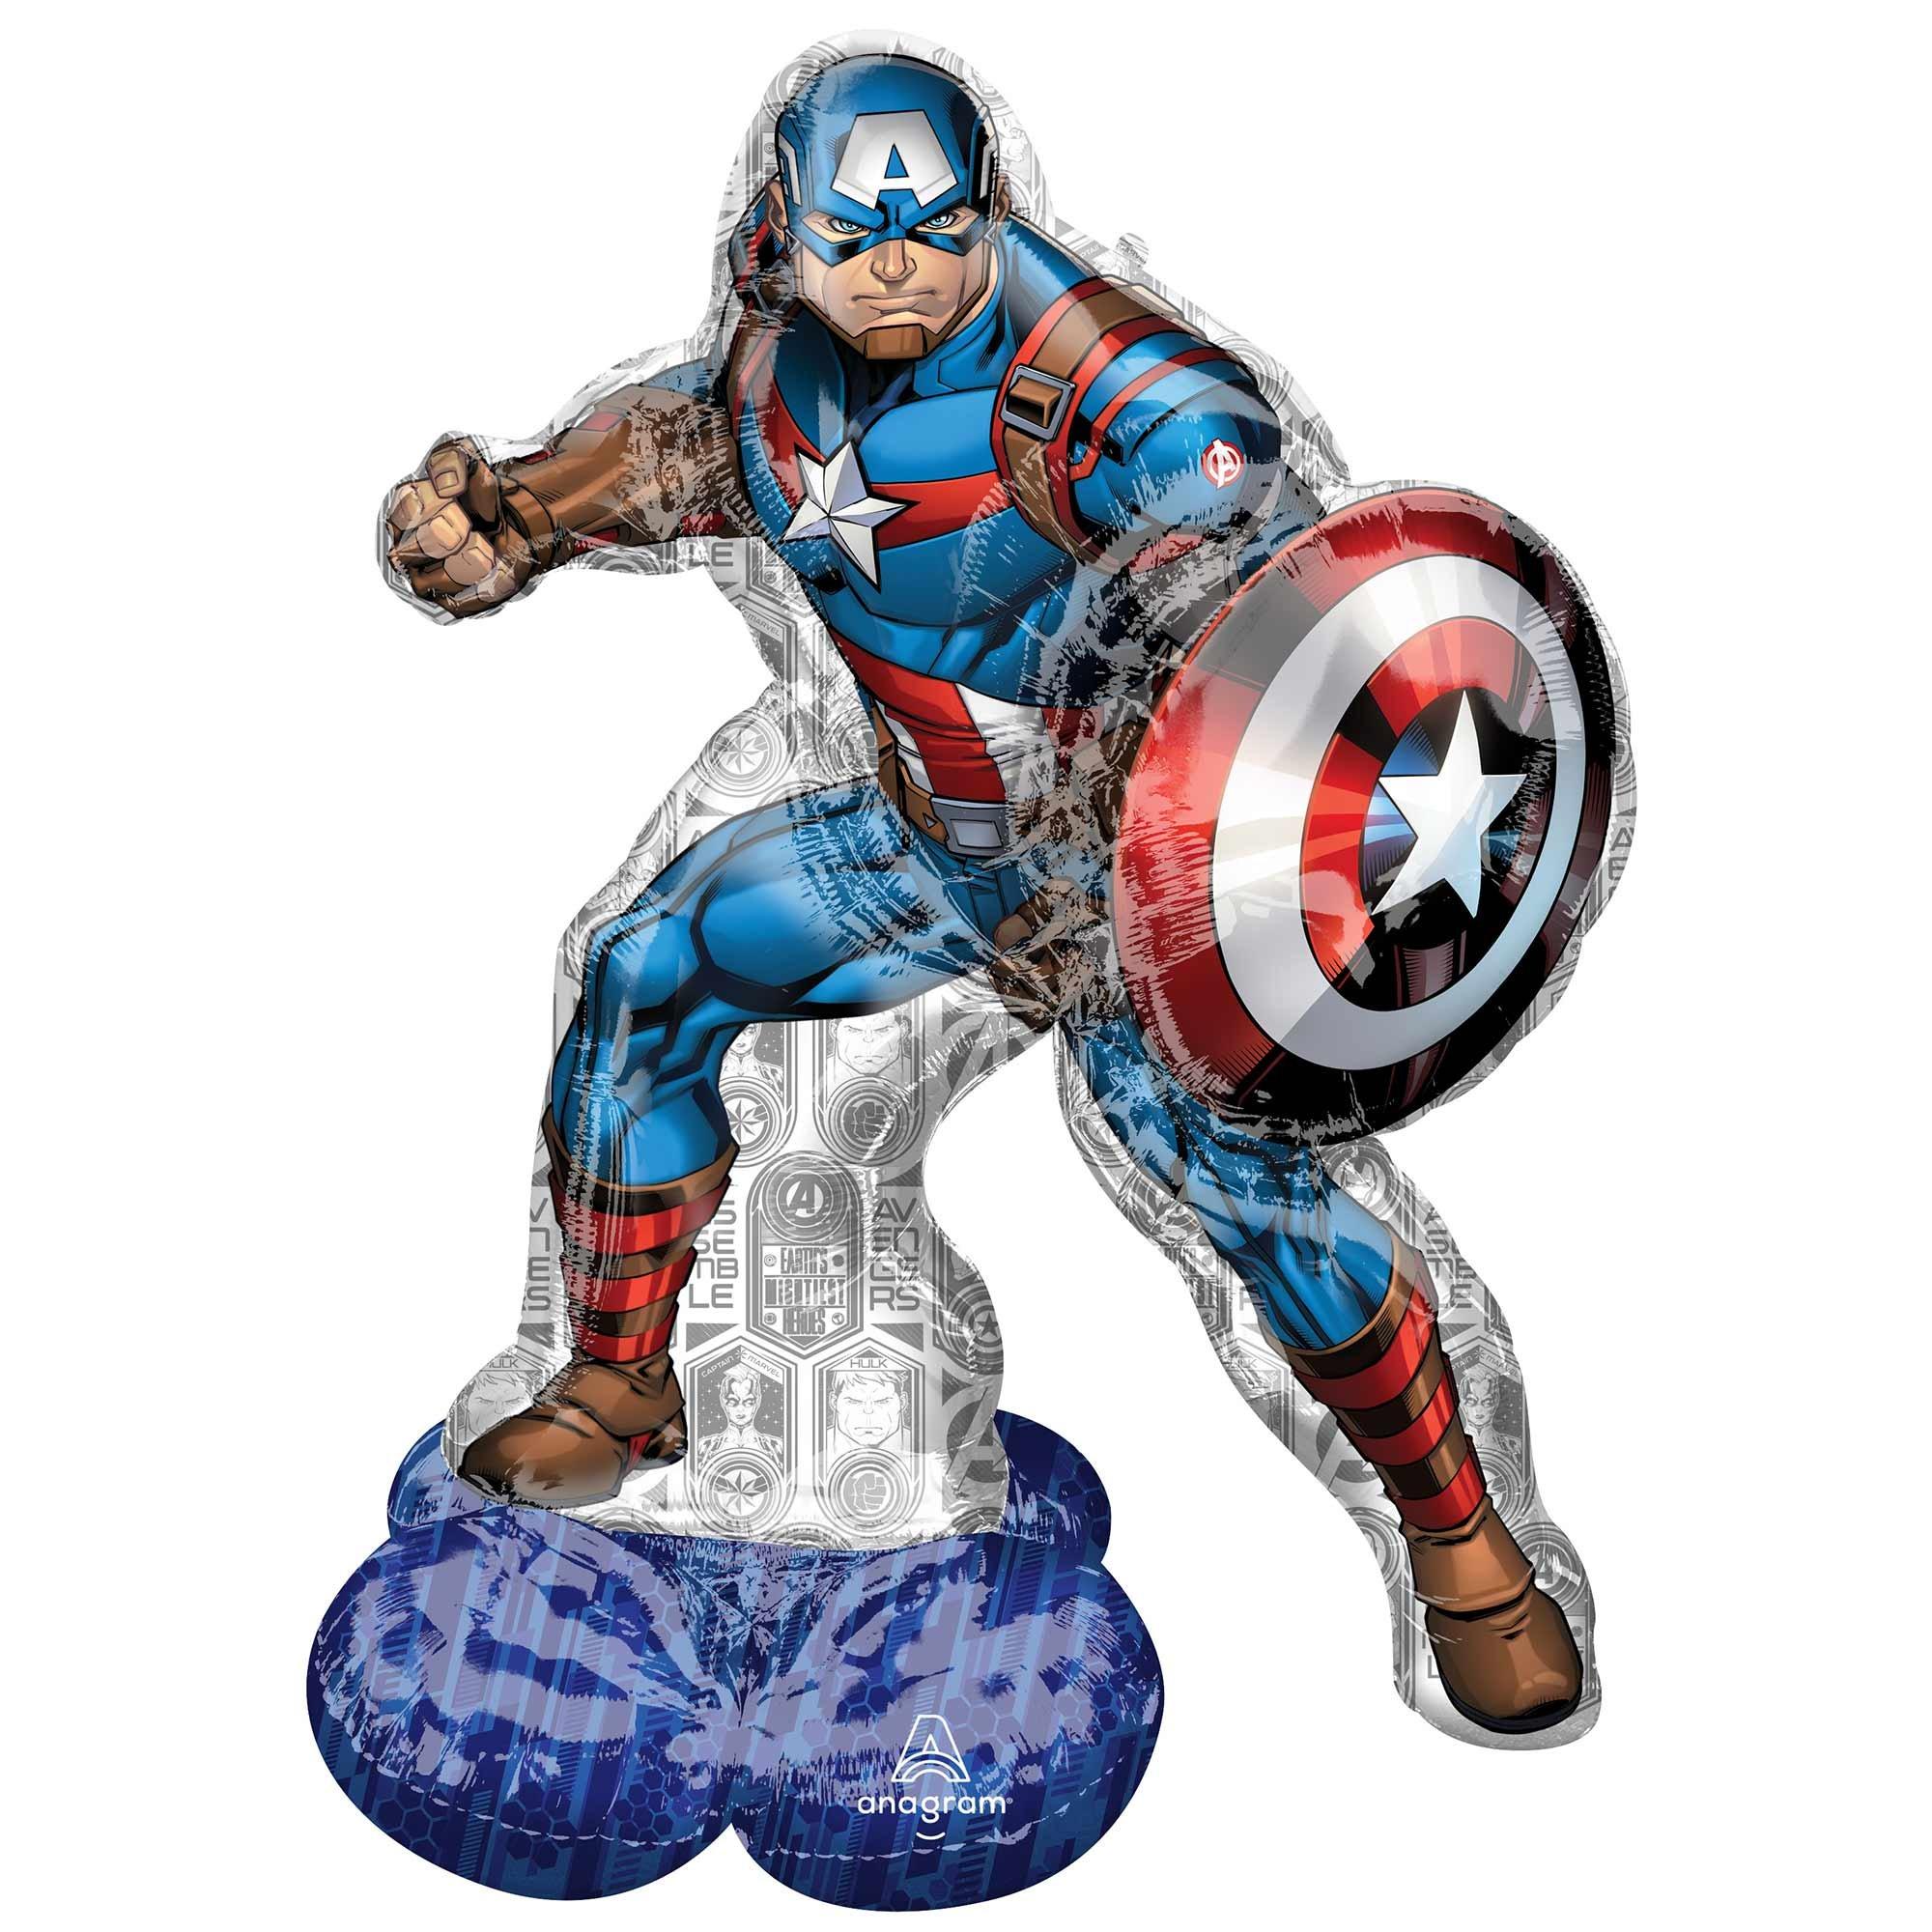 CI: AirLoonz Marvel Avengers Captain America P82